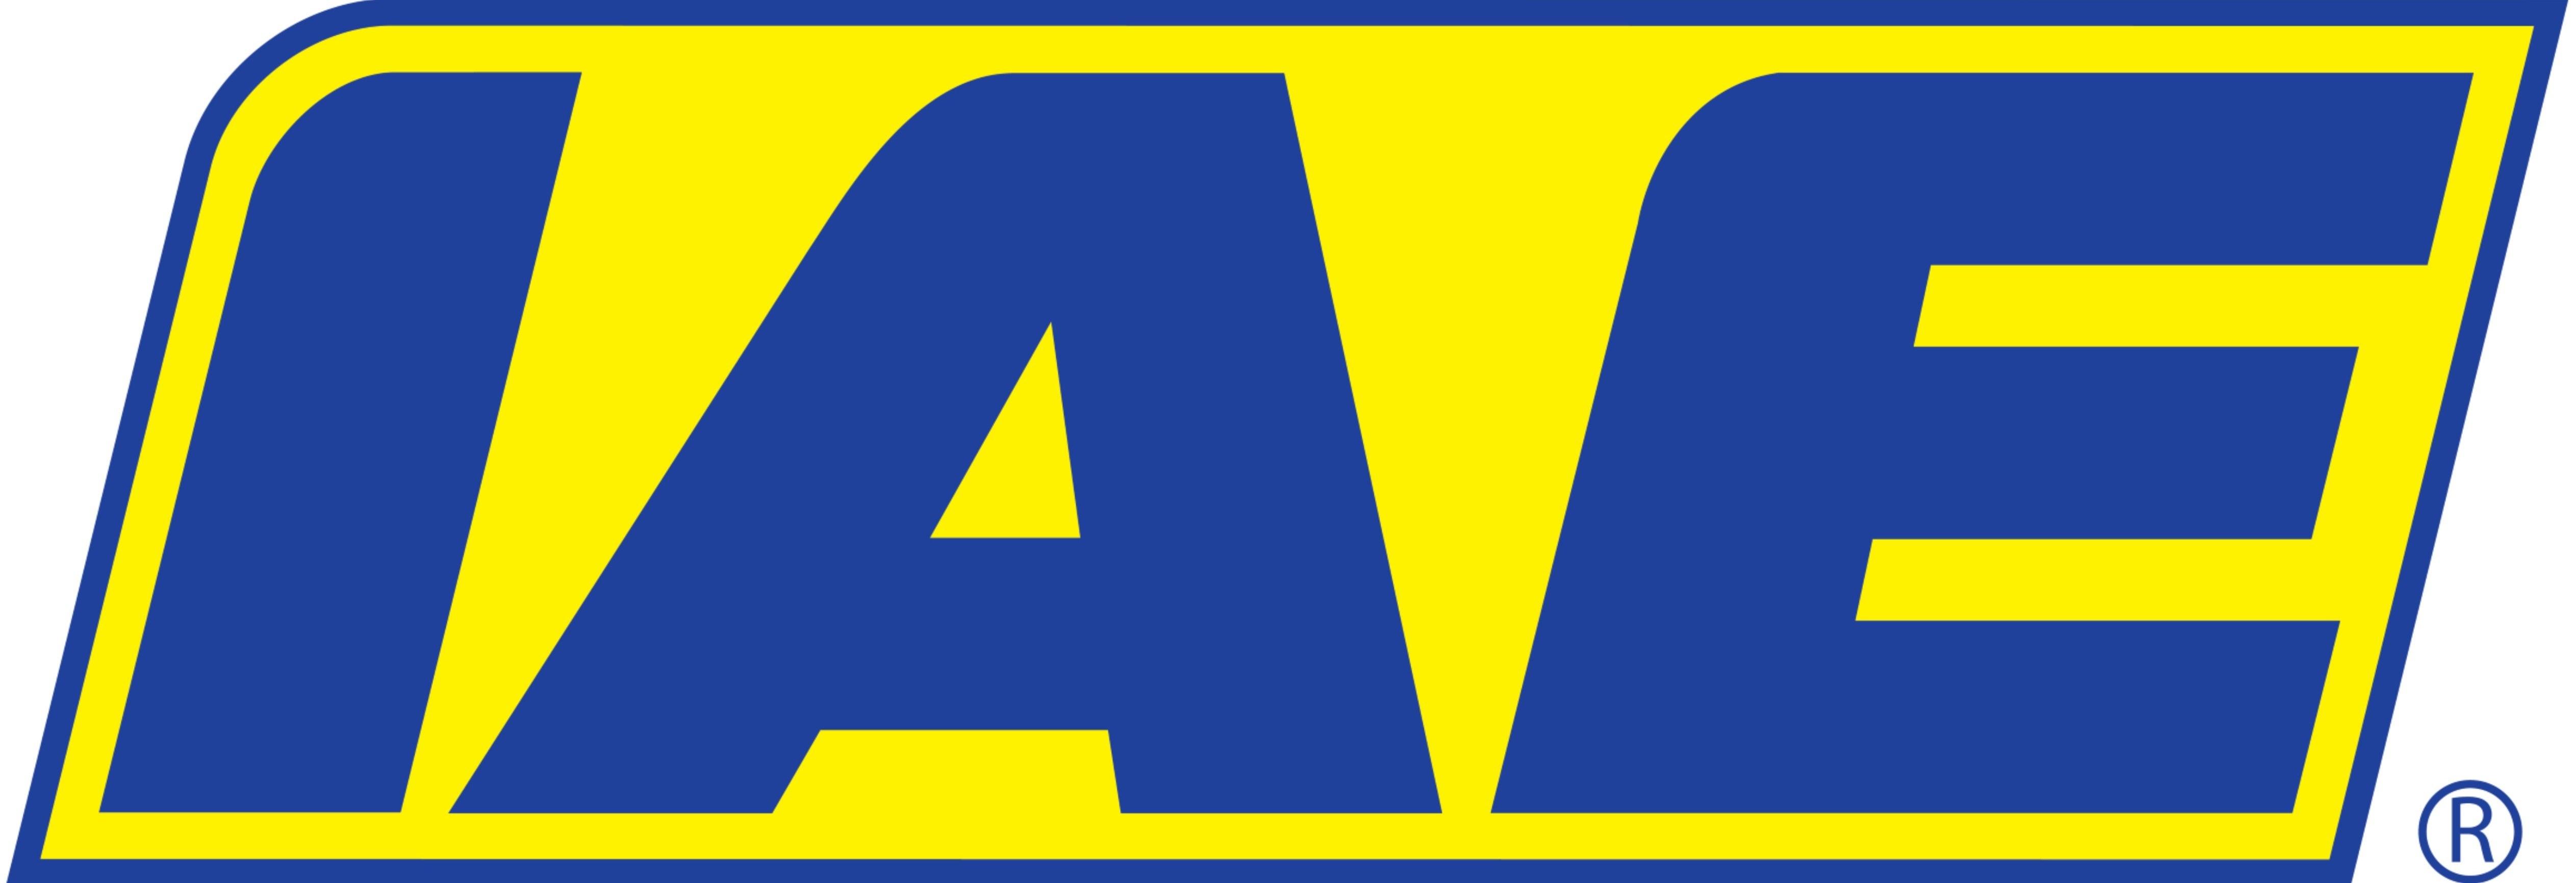 Iae Logo Blue R